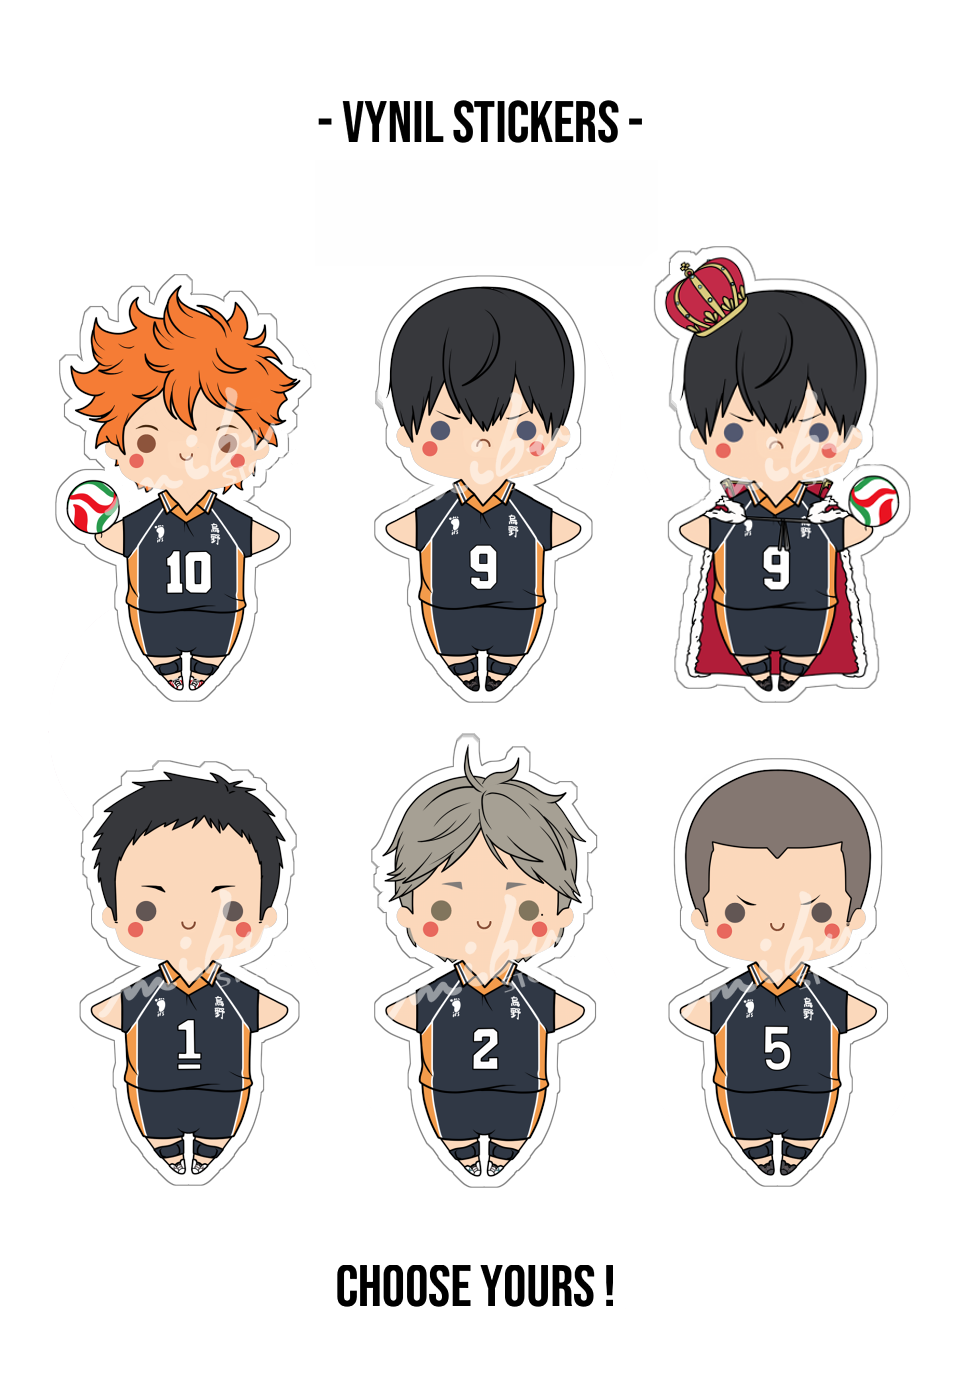 Haikyuu Vinyl Stickers In 2020 Cute Stickers Anime Stickers Haikyuu